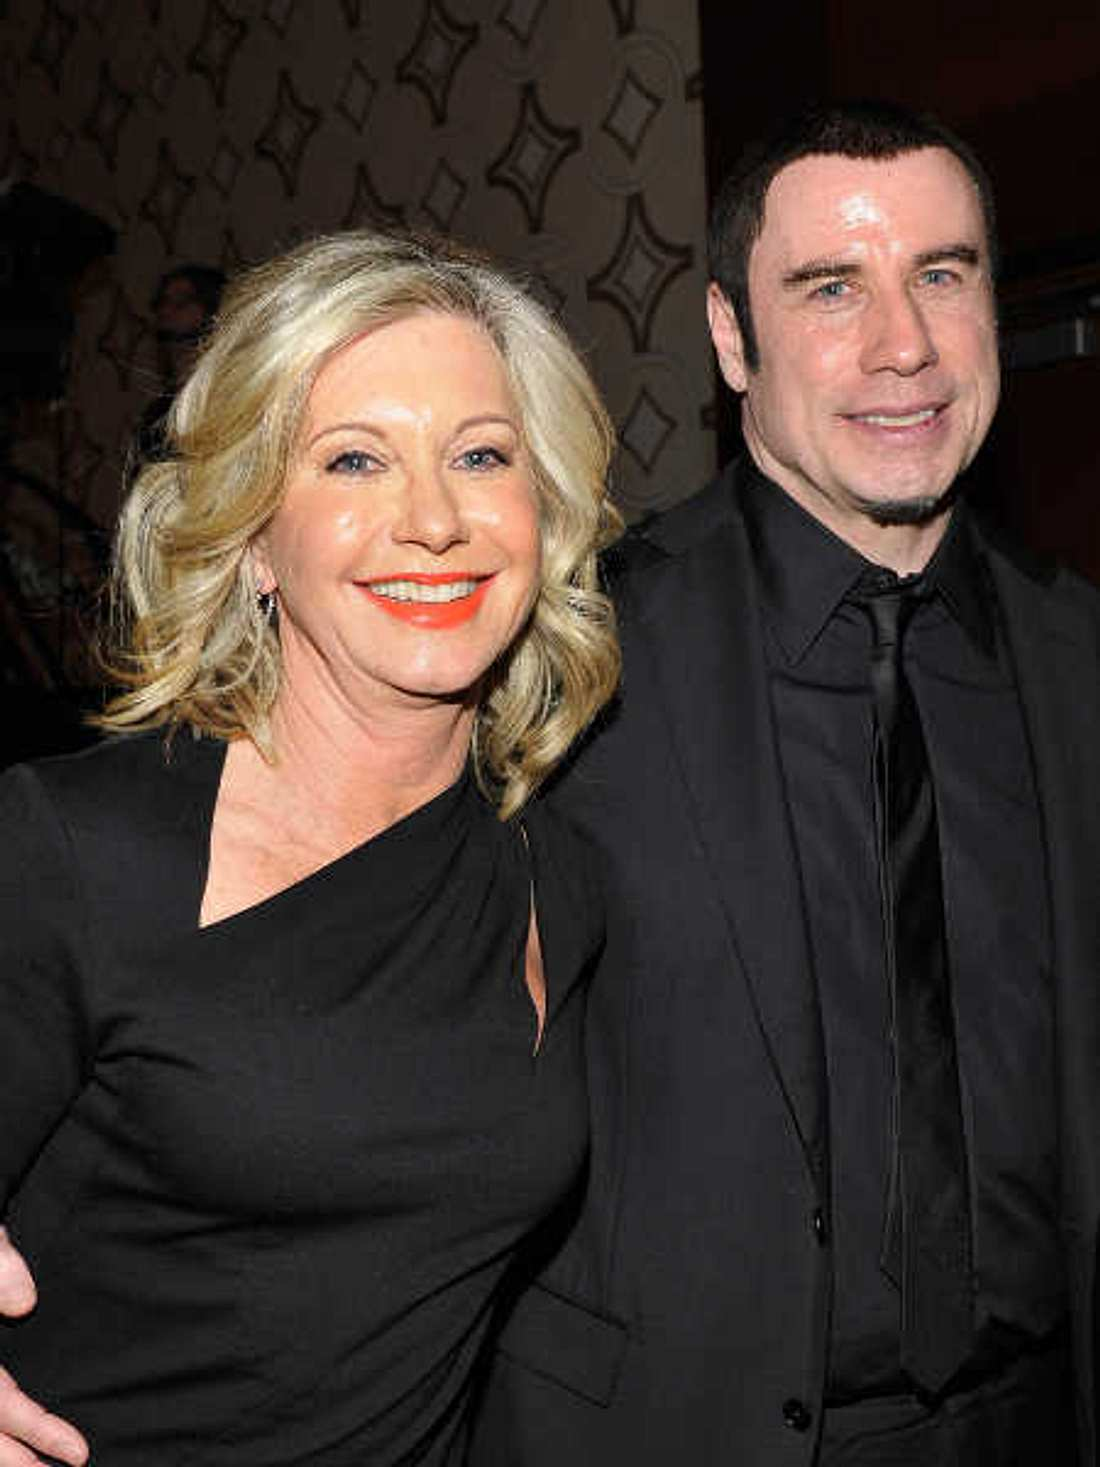 Olivia Newton-John und John Travolta sind gute Freunde.